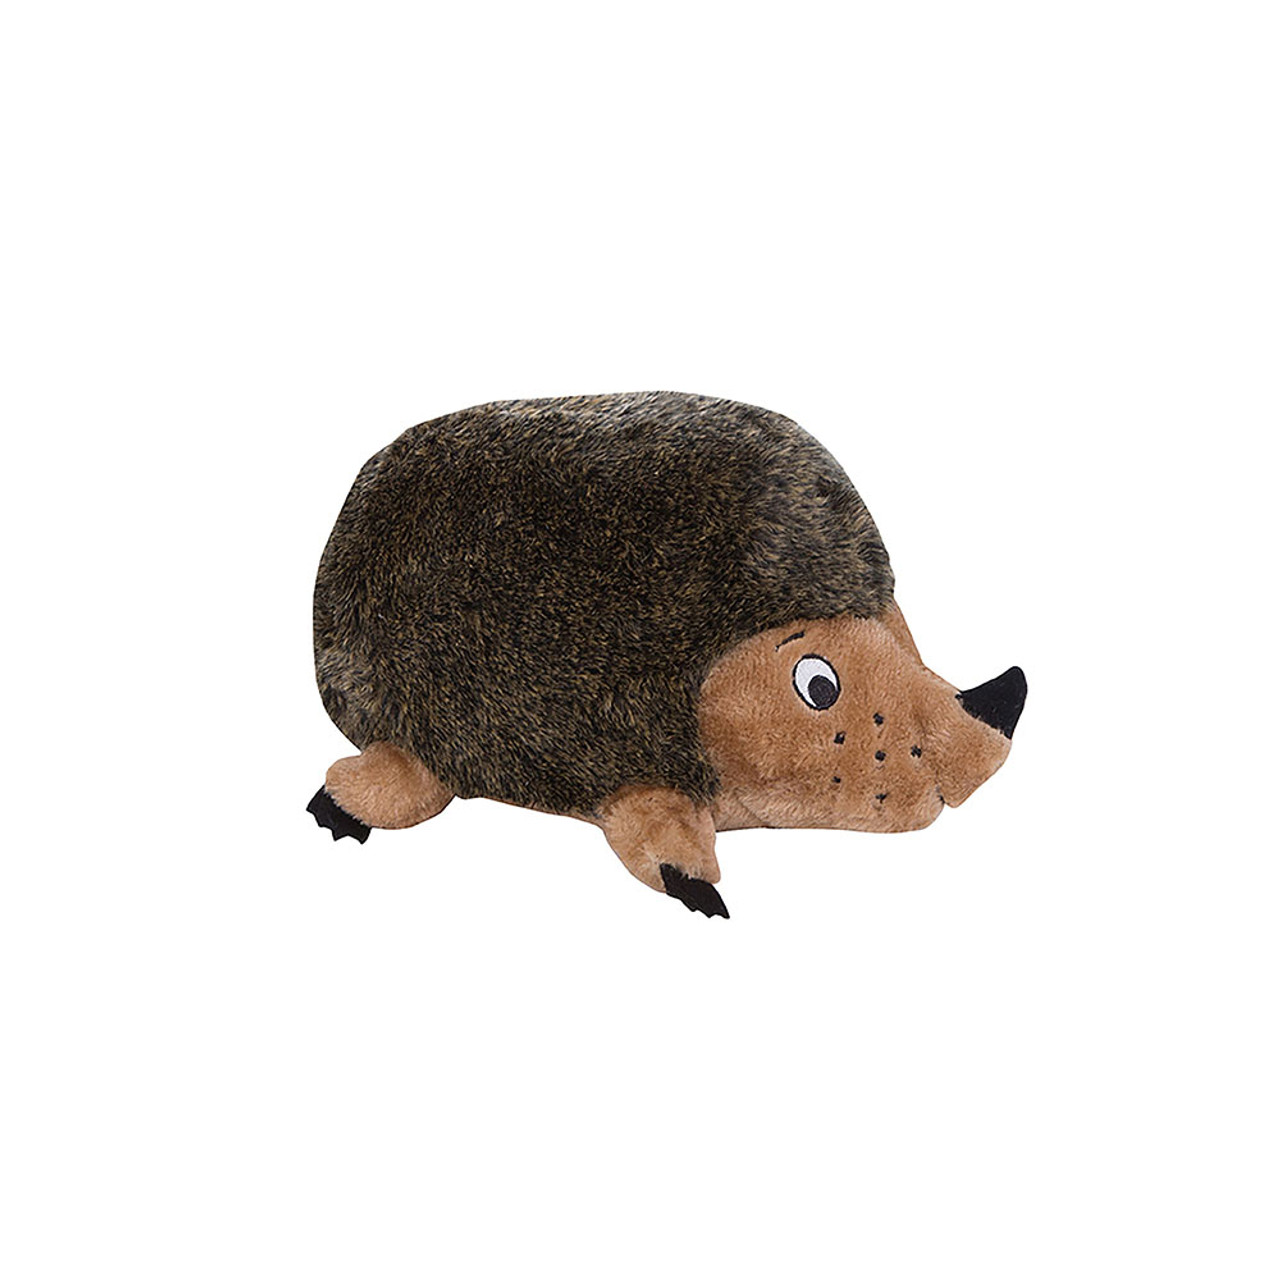 Outward Hound Hedgehogz Plush Dog Toy